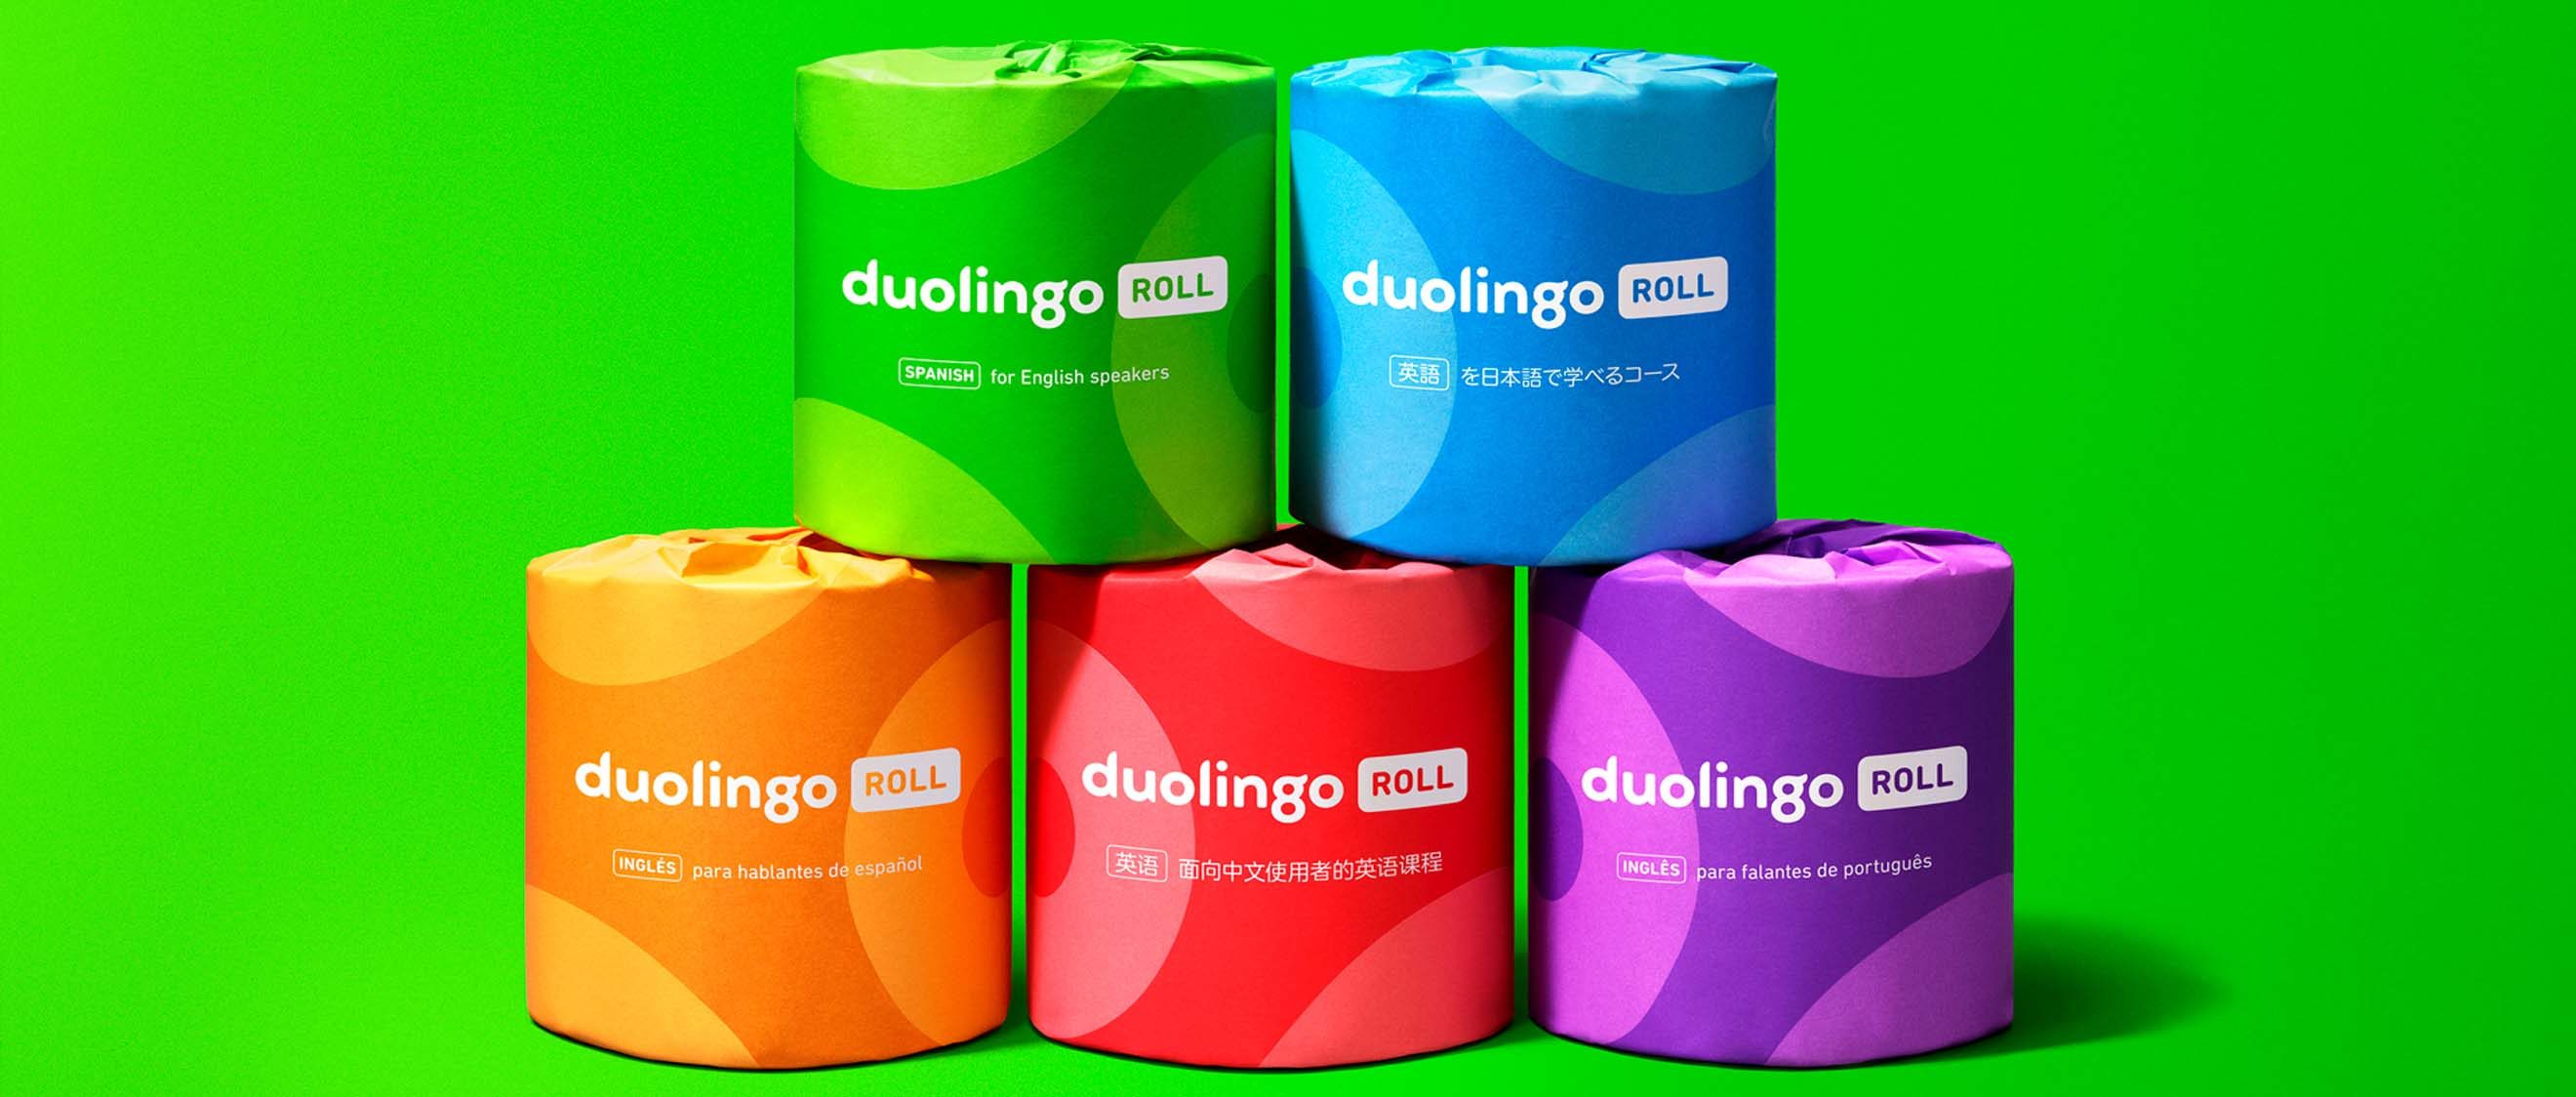 Duolingo Roll